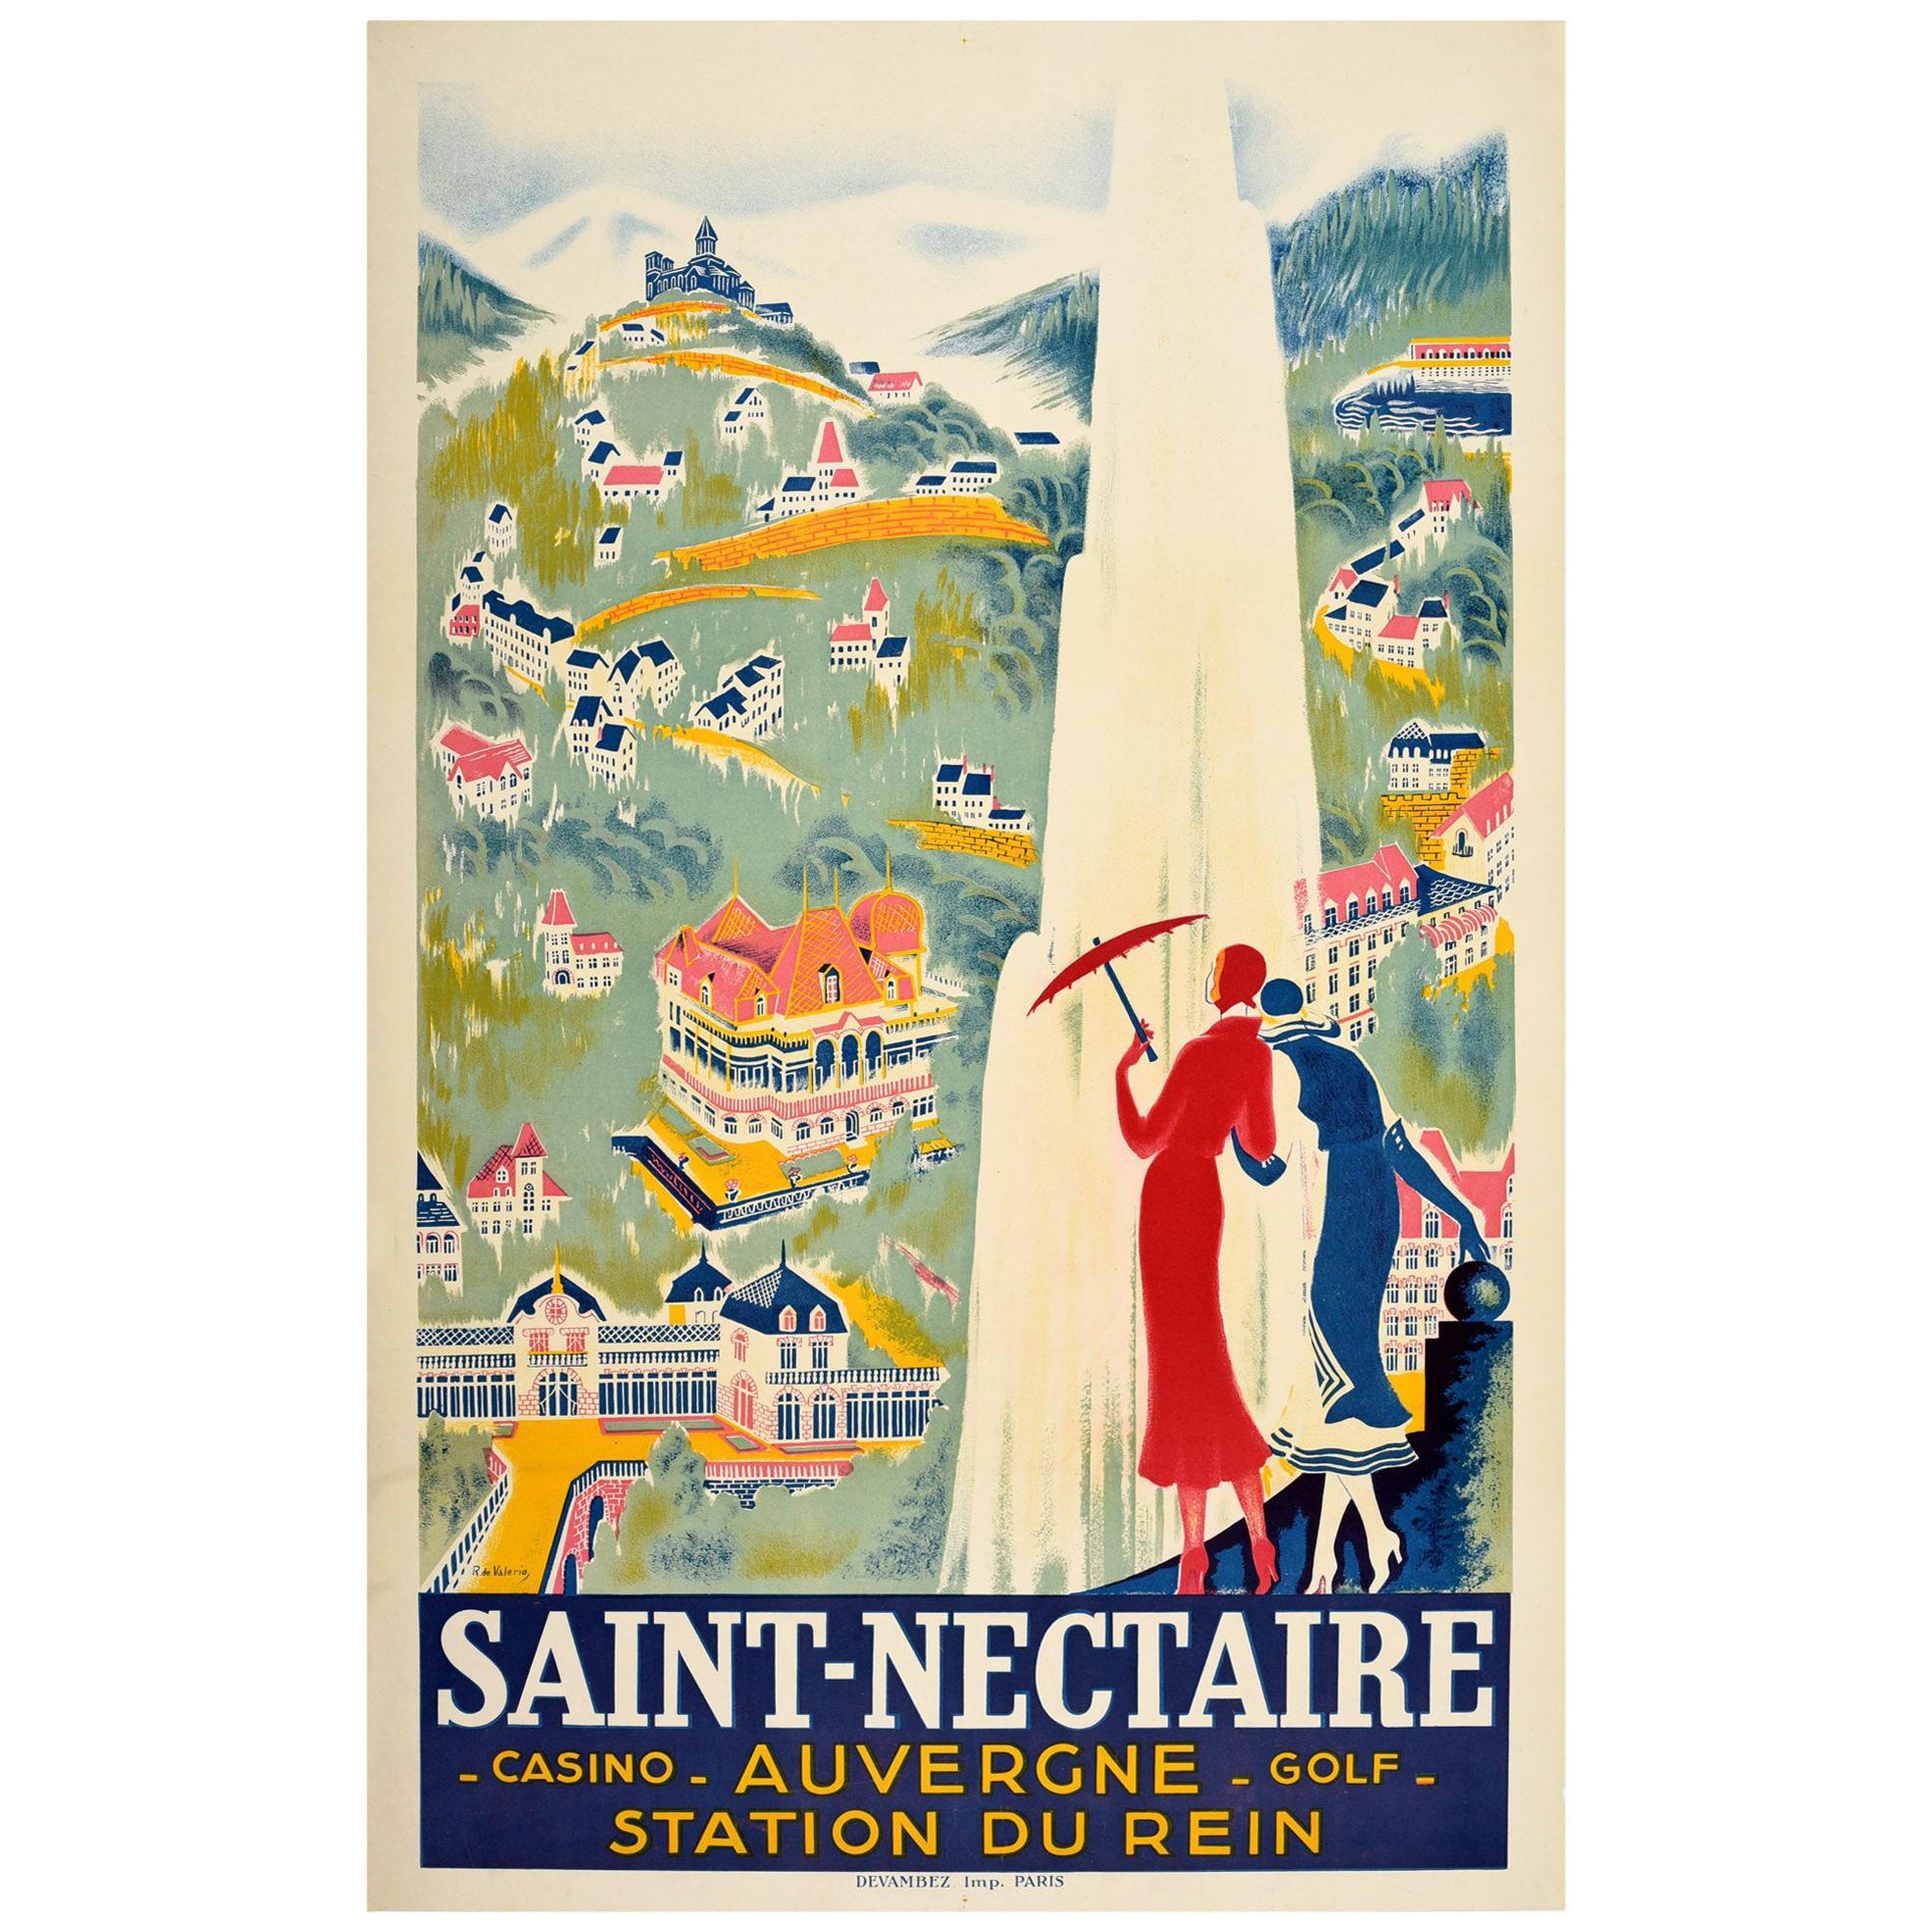 Original Vintage Art Deco Travel Poster Saint-Nectaire Casino Golf Spa Auvergne